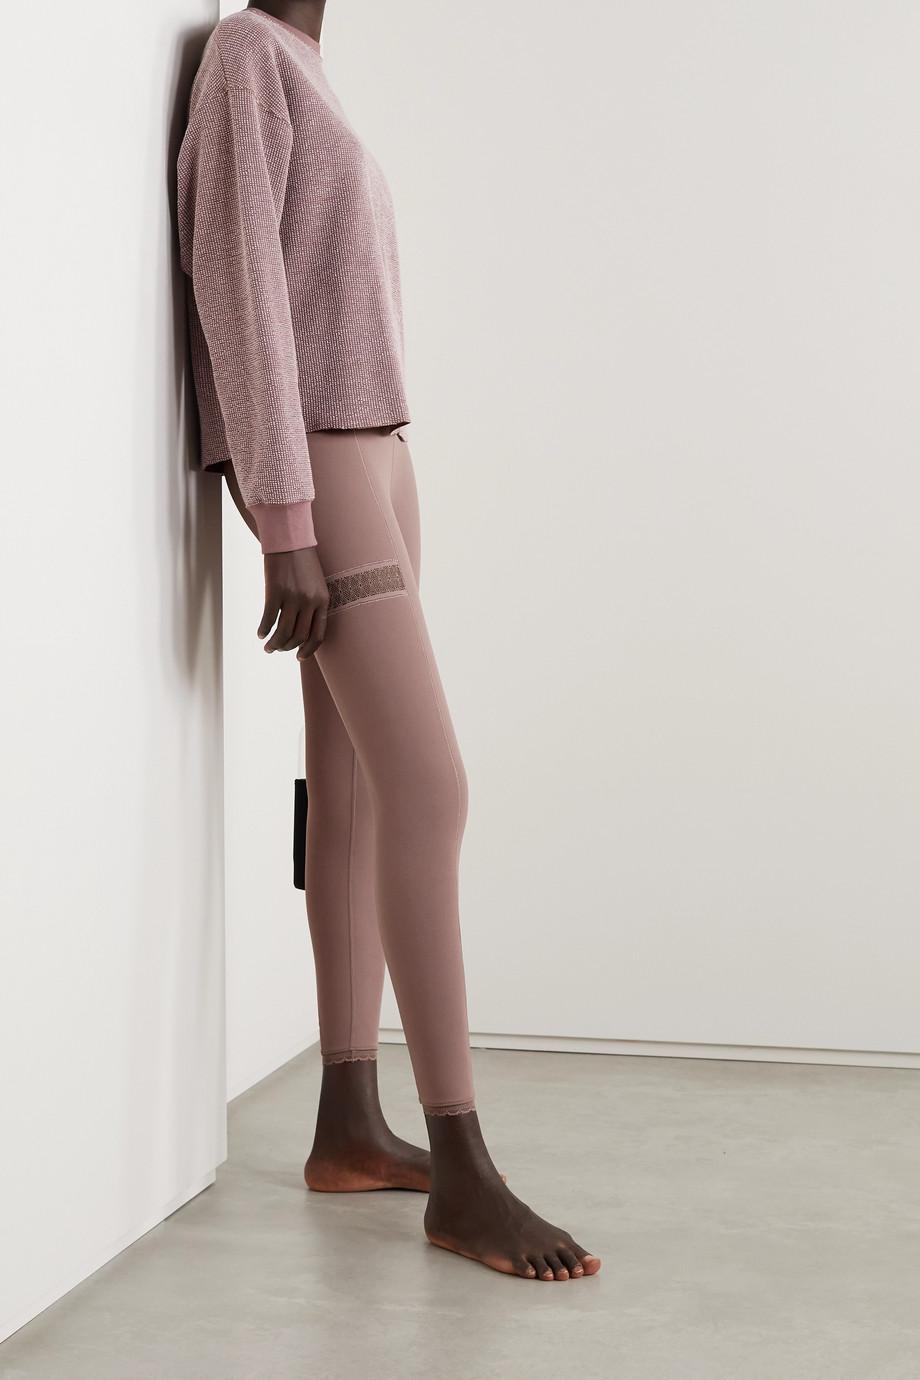 Nike Yoga Infinalon lace-trimmed Dri-FIT leggings